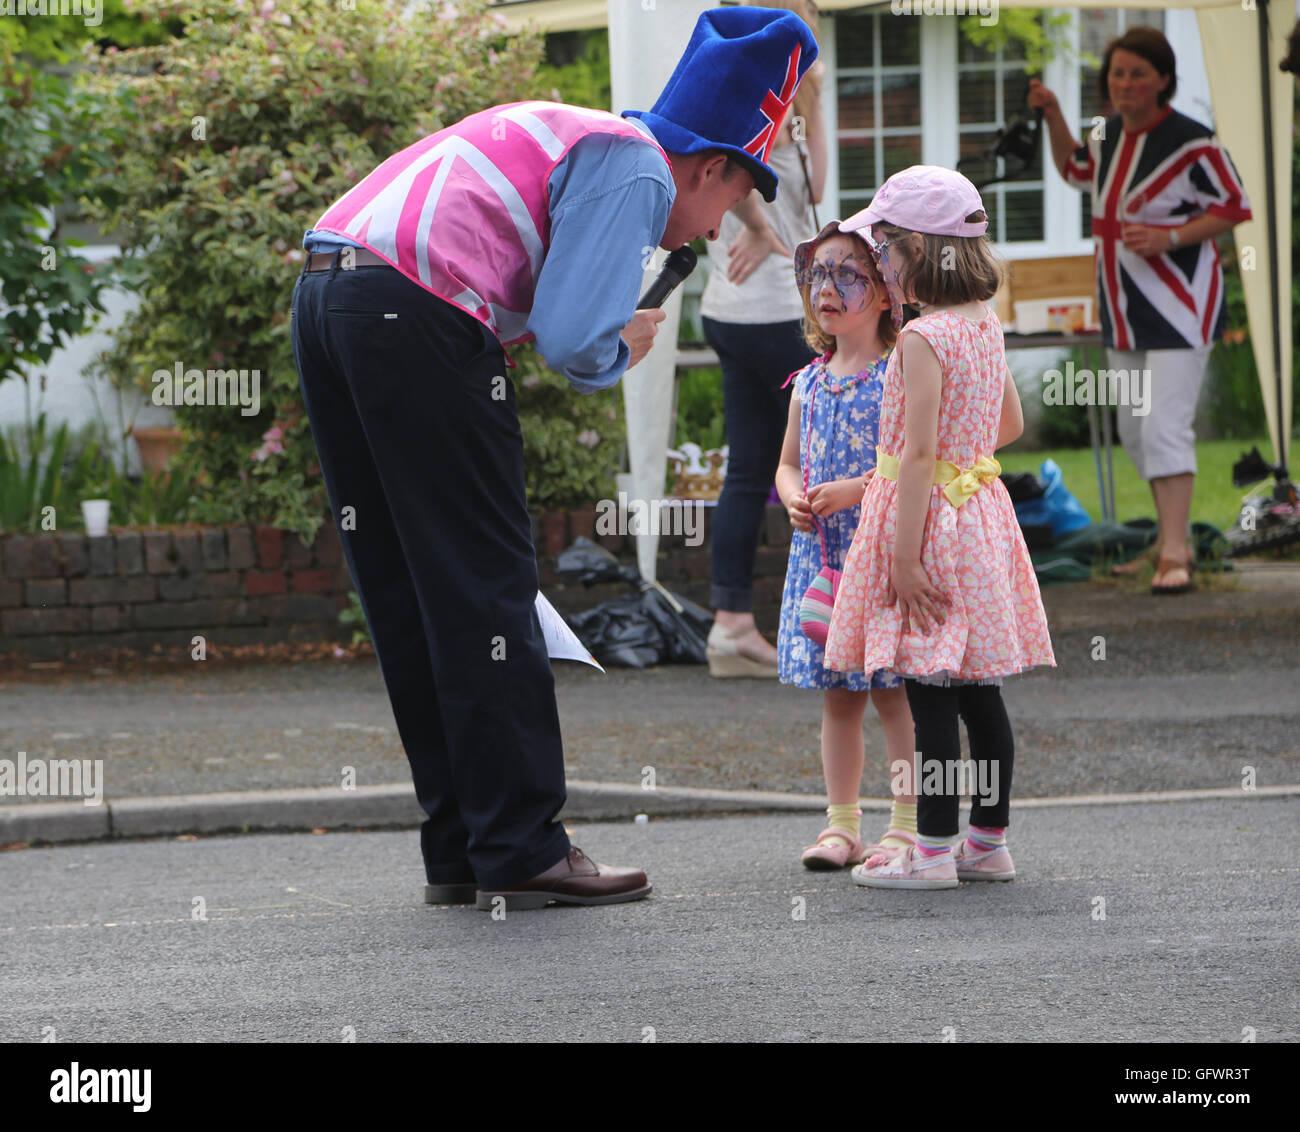 Street Party Held In Celebration Of Queen Elizabeth II 90th Birthday